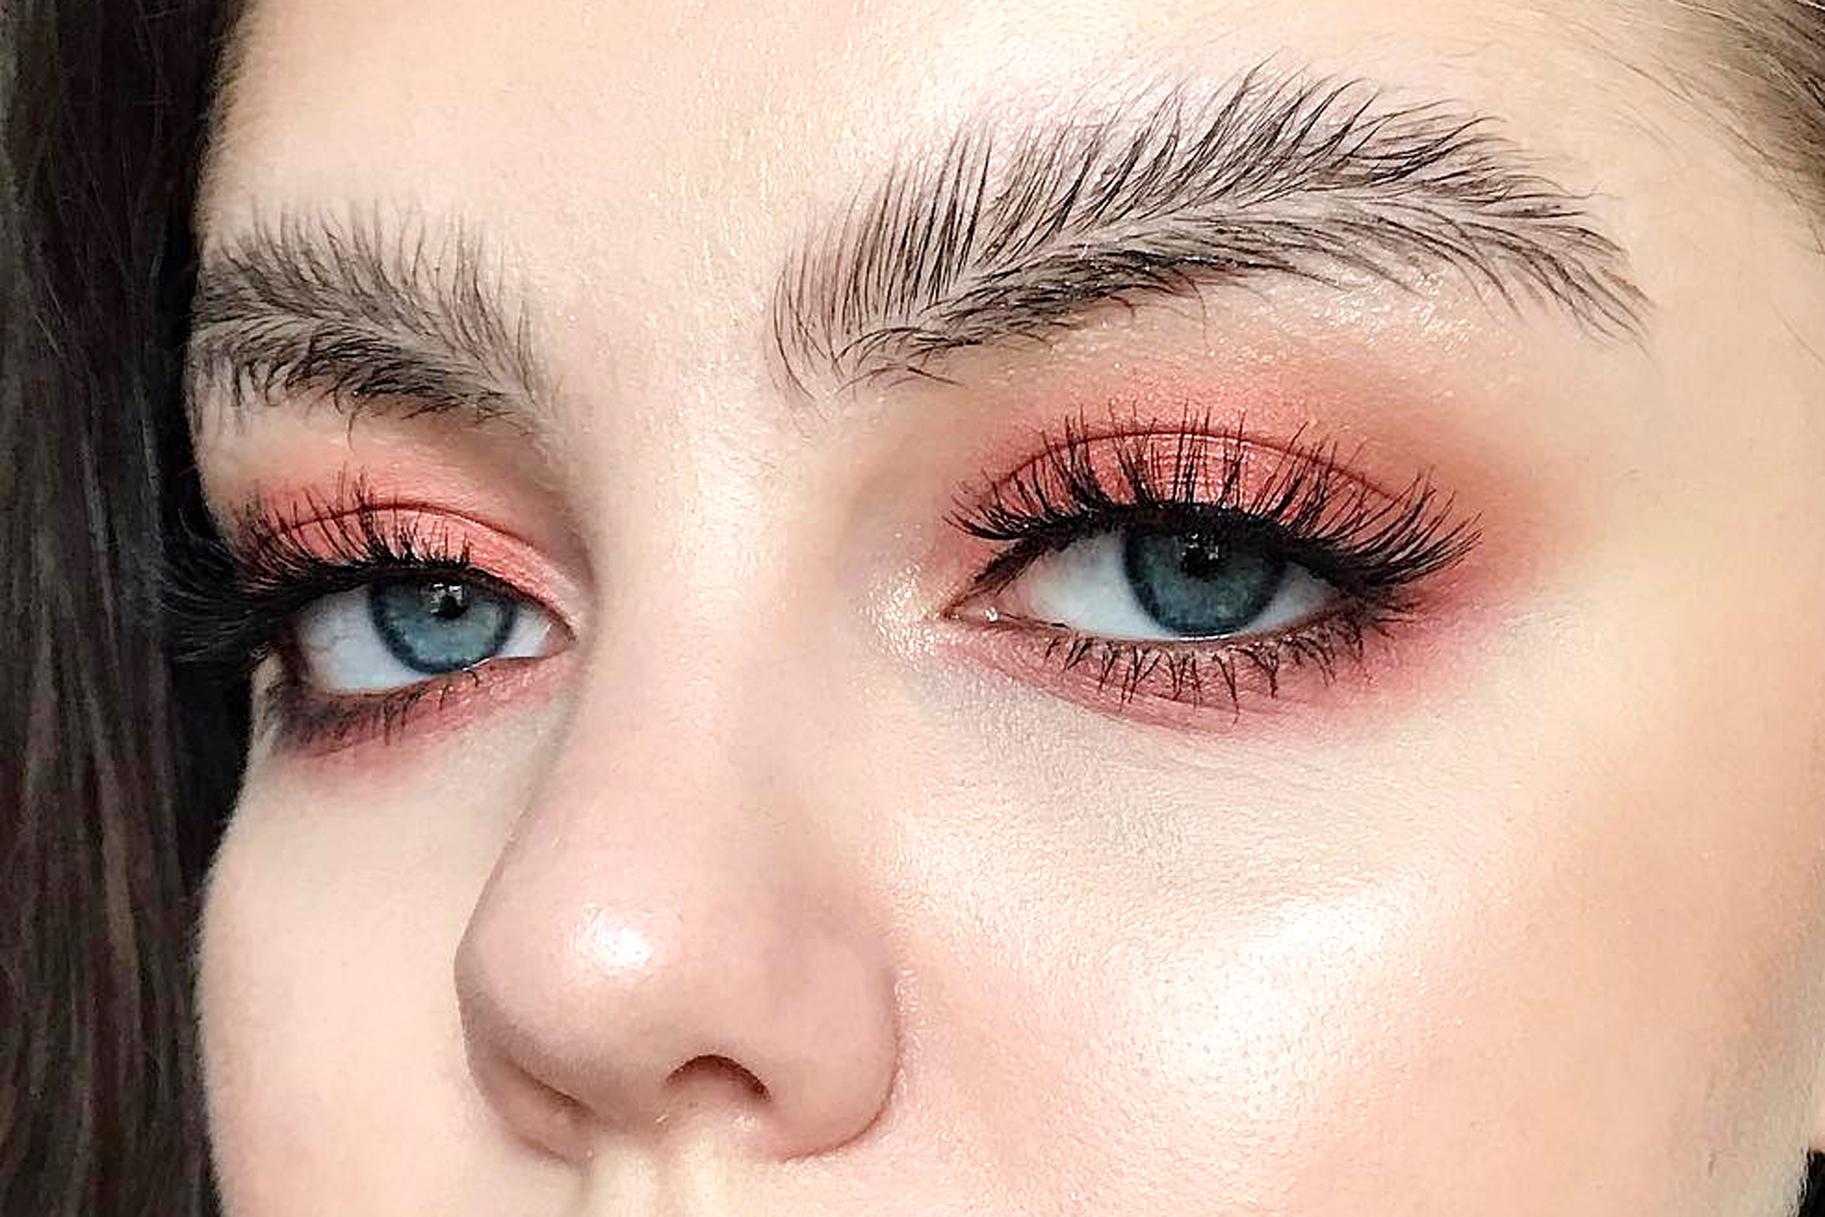 Cejas pluma, tendencia en maquillaje